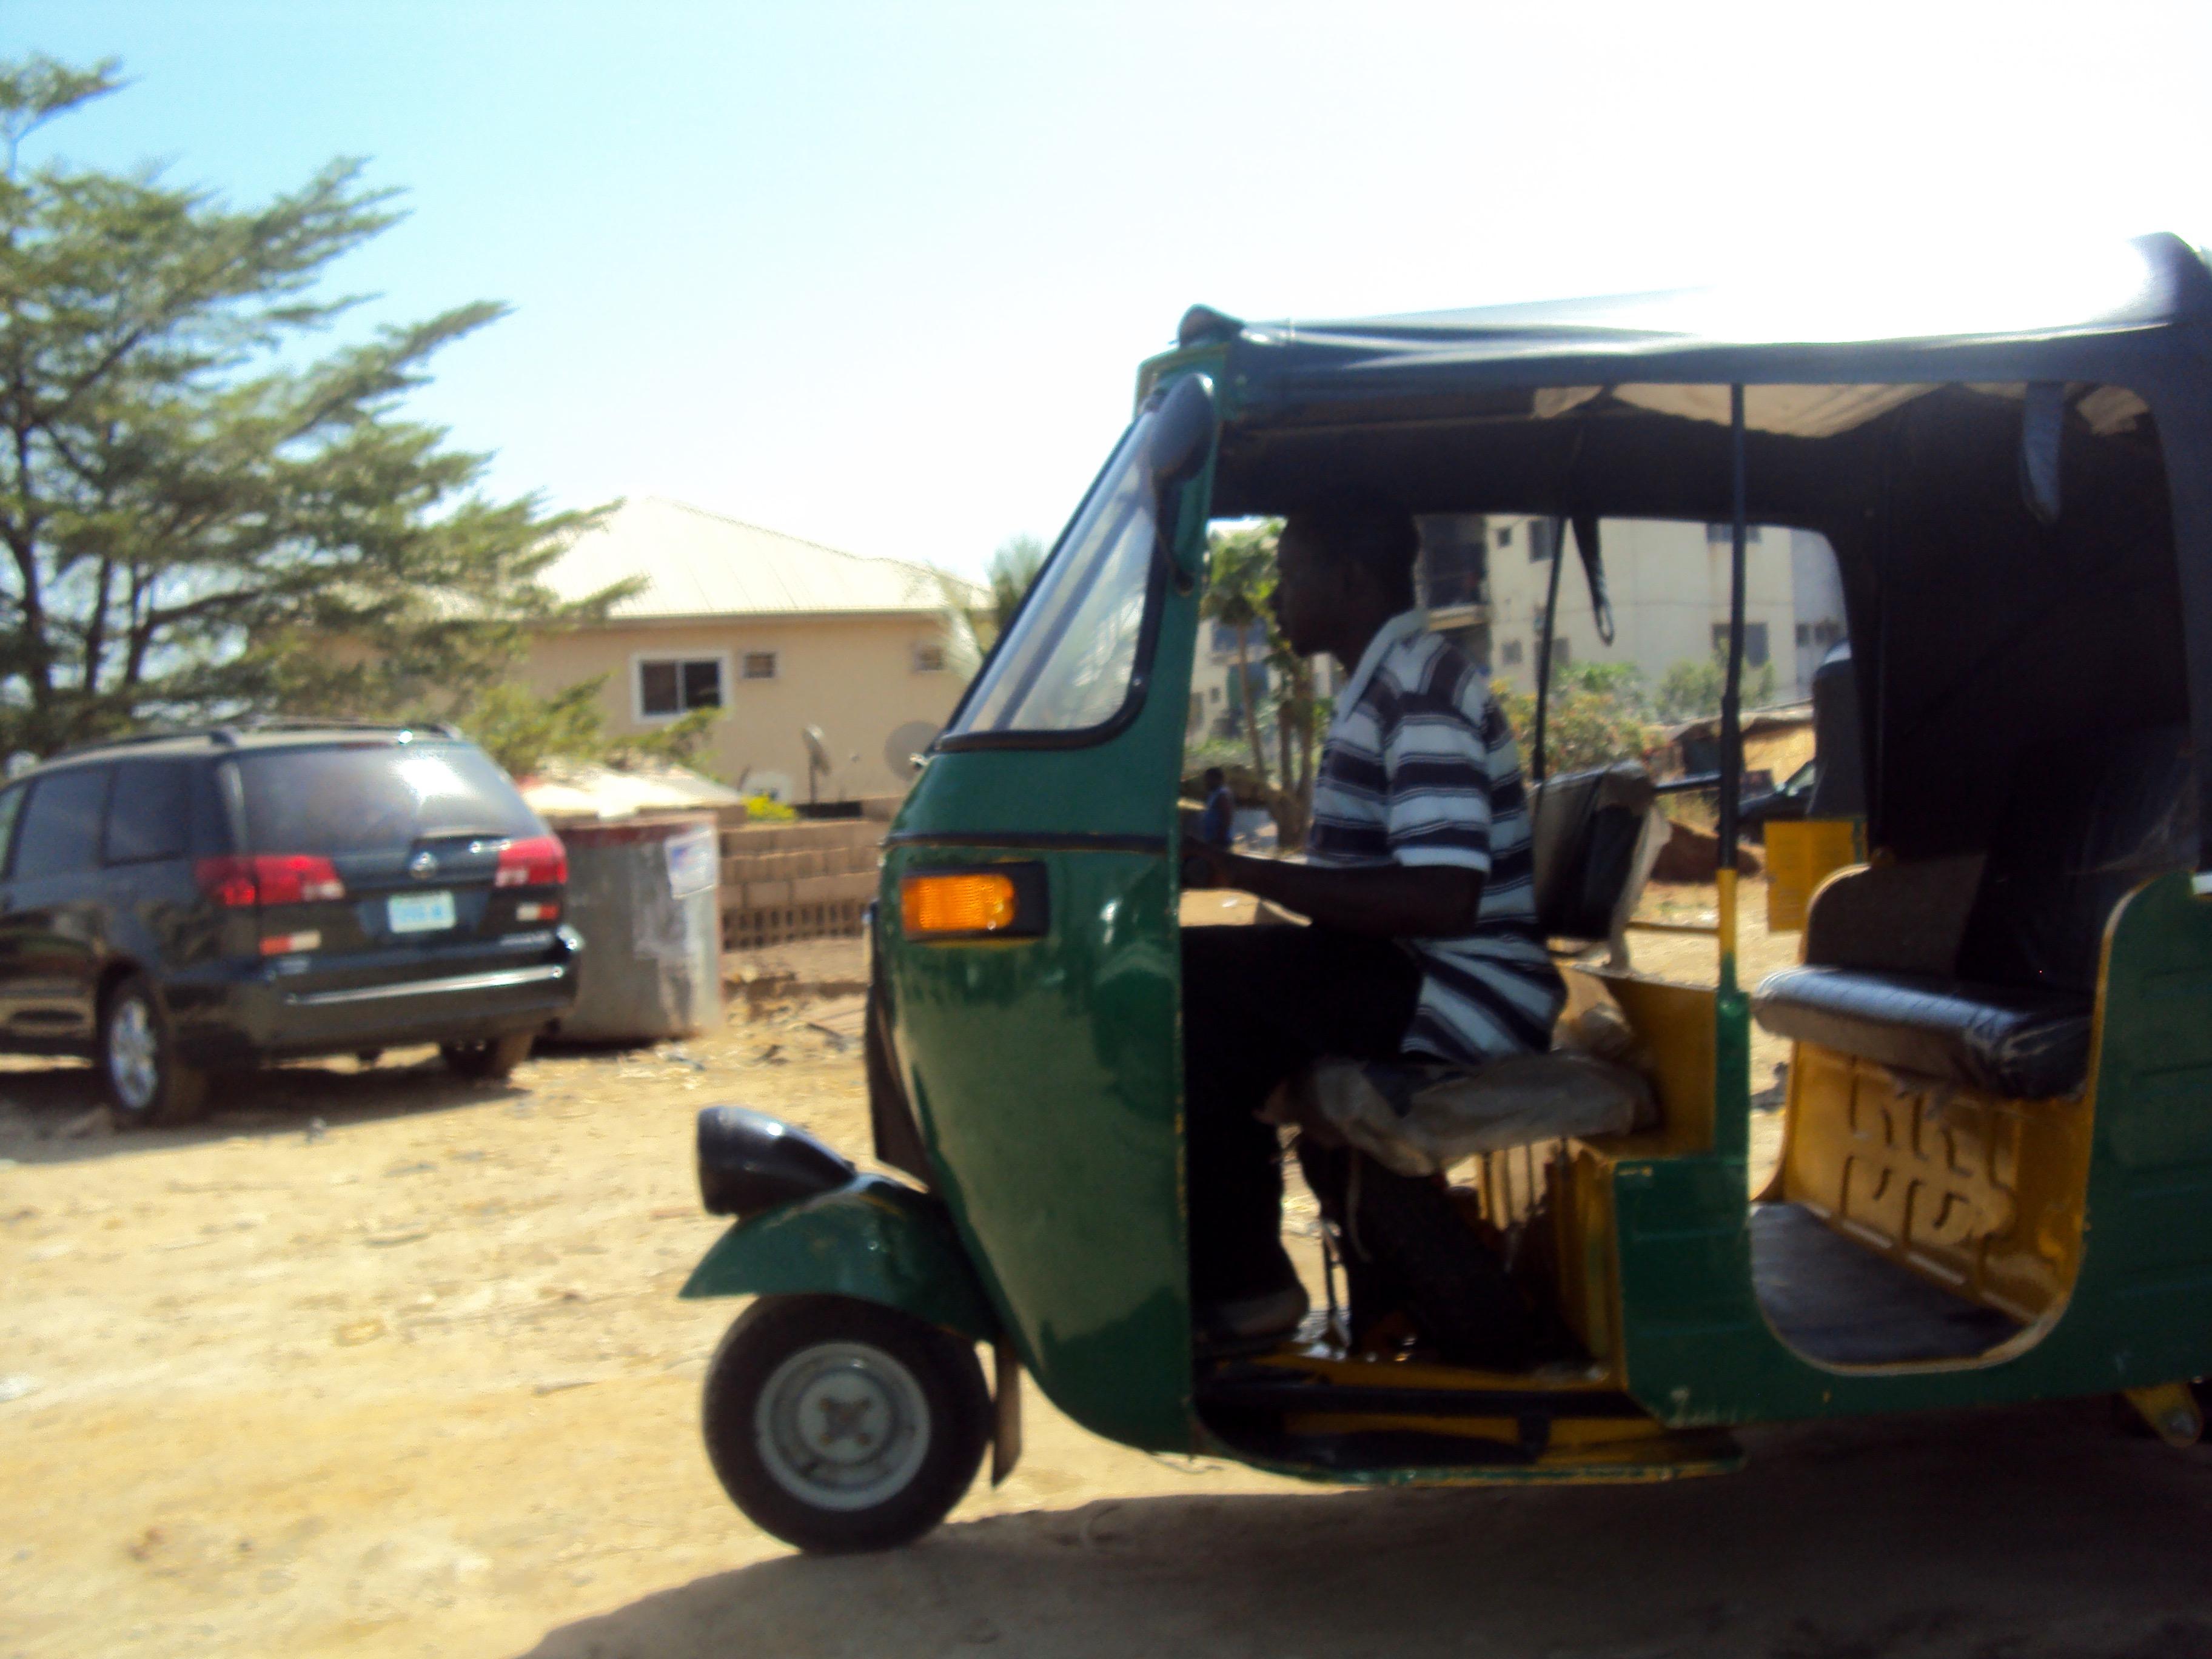 Keke in Gwarinpa, FCT, Abuja, Nigeria. #JujuFilms